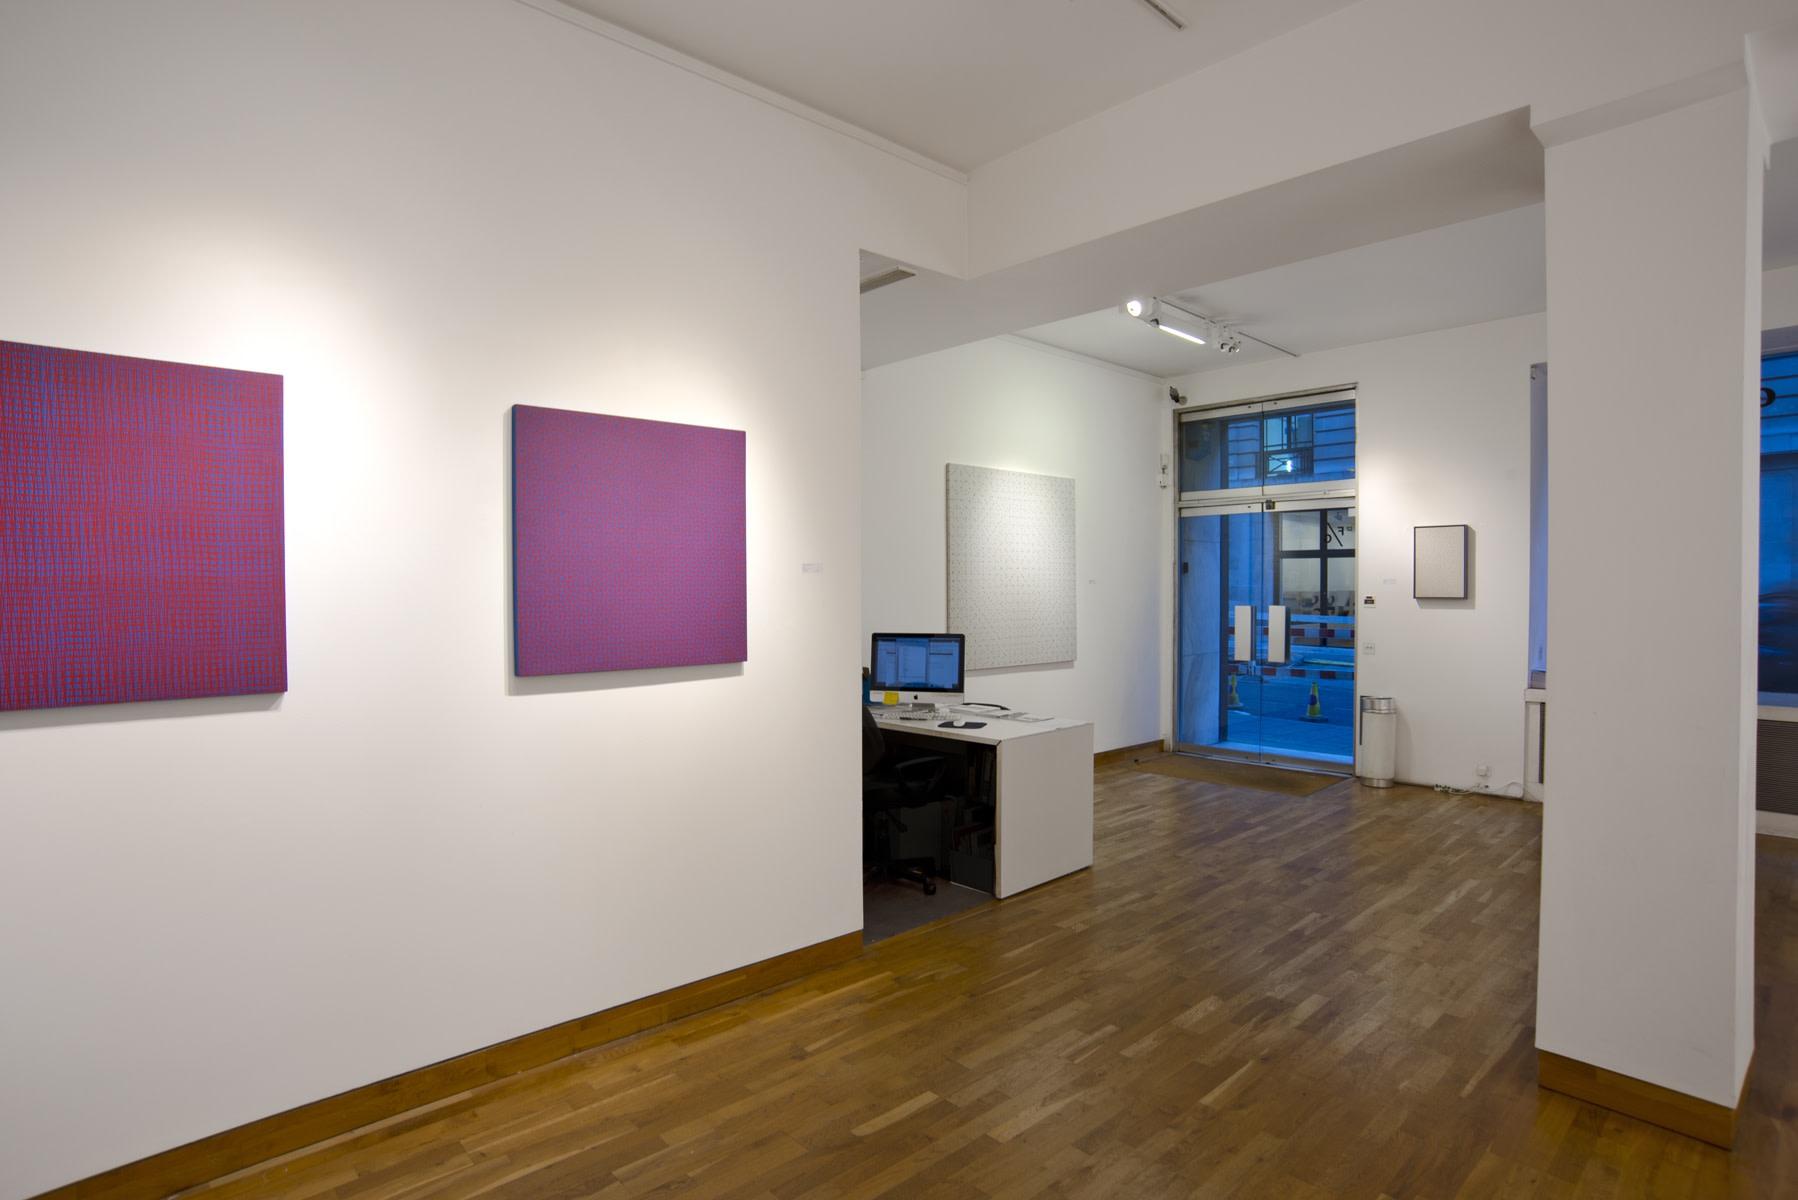 "<span class=""link fancybox-details-link""><a href=""/exhibitions/67/works/image_standalone149/"">View Detail Page</a></span><p>MORELLET & VON GRAVENITZ | MOVING SPIRITS | 1 NOV - 17 DEC 2012 | Installation View</p>"